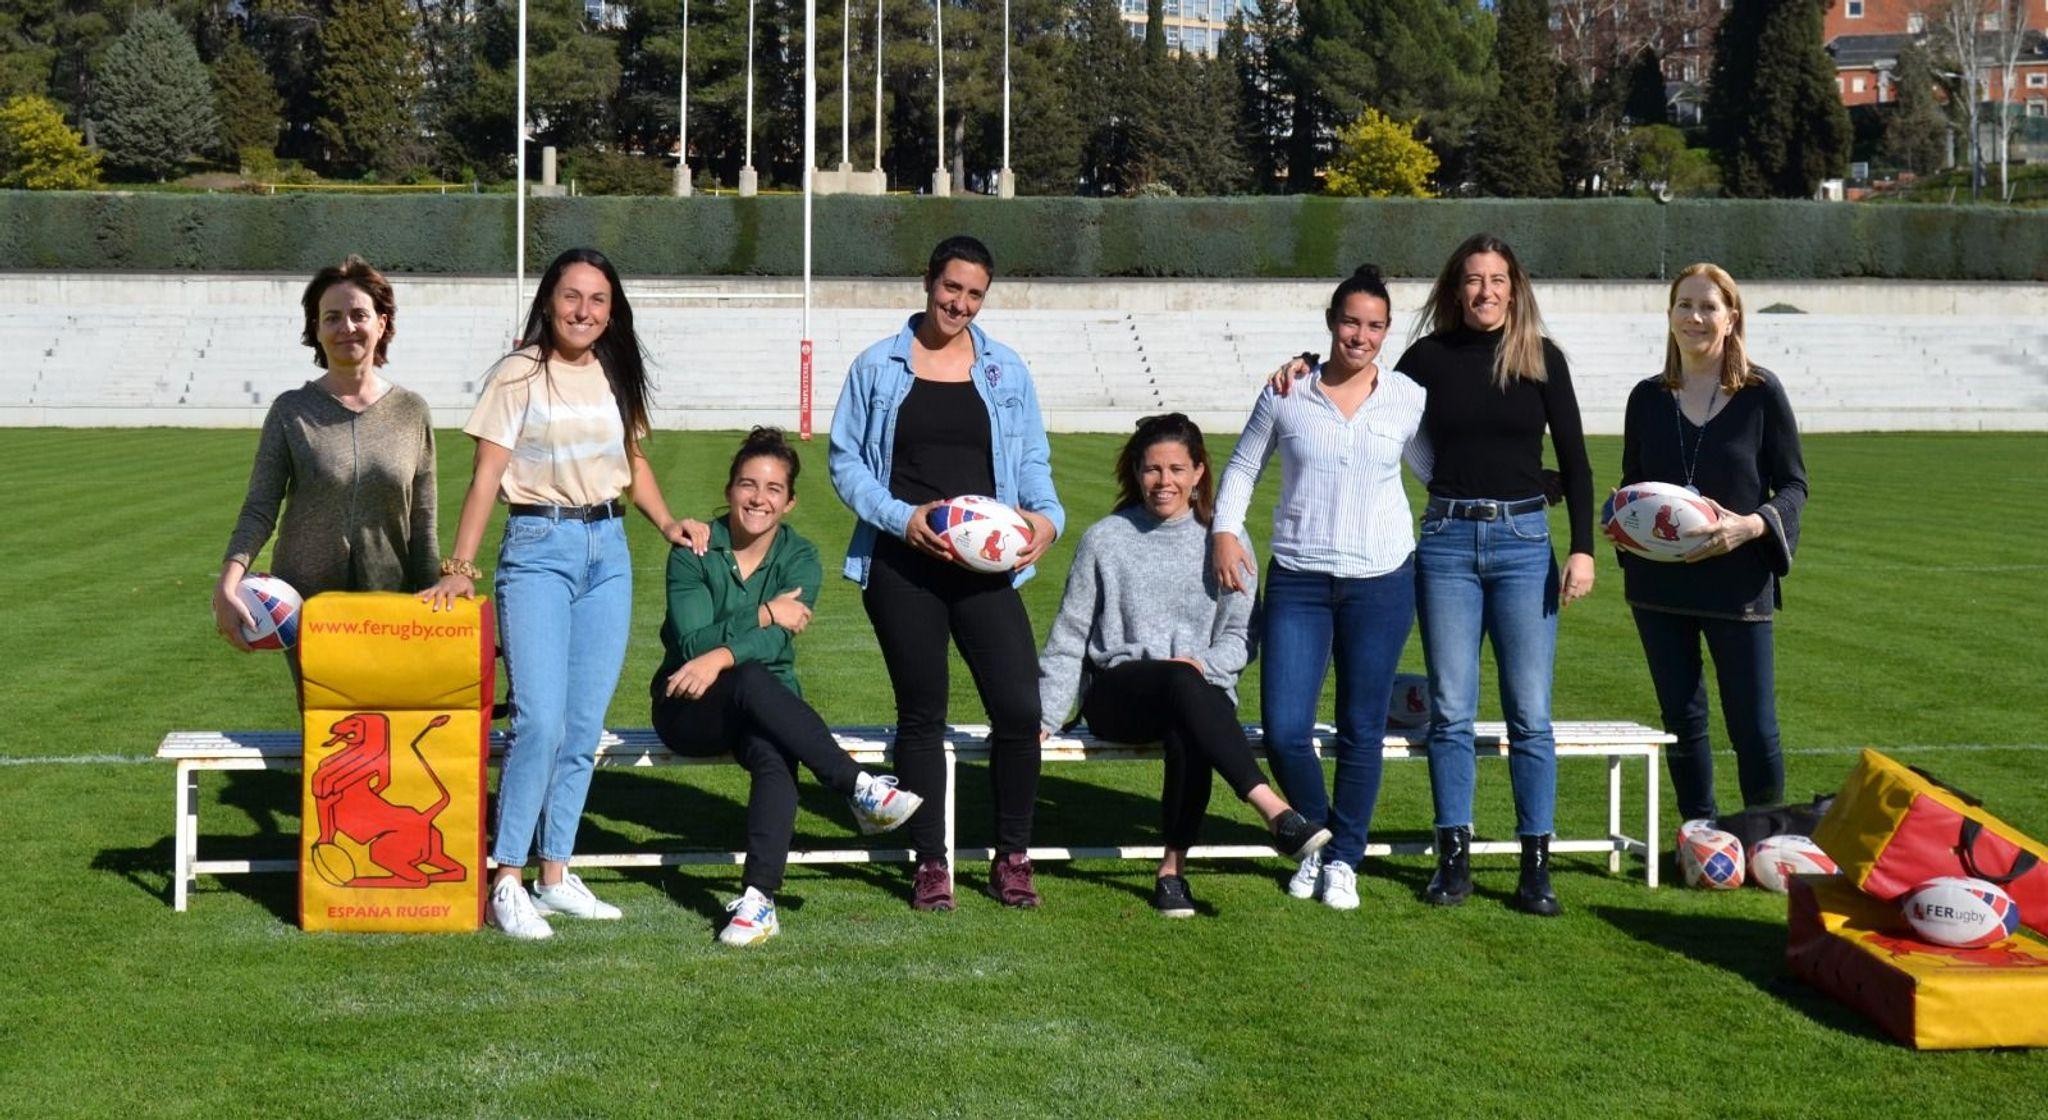 Spain not resting on laurels despite huge growth in women's rugby